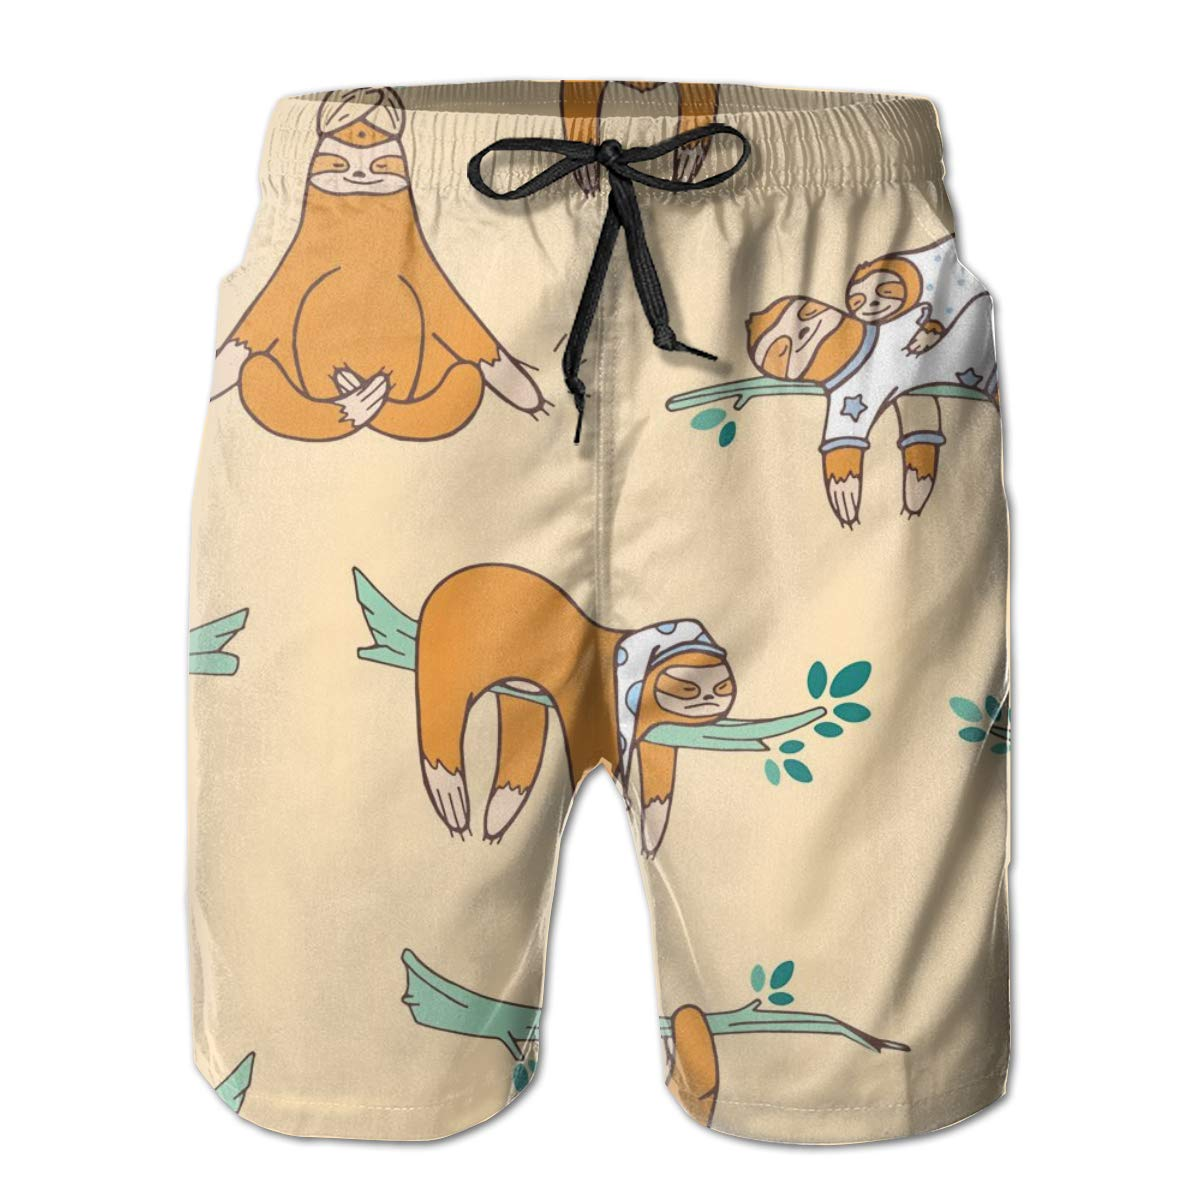 SARA NELL Mens Shorts Cute Sloths Sleeping Quick Dry Swim Trunks Beach Board Shorts White